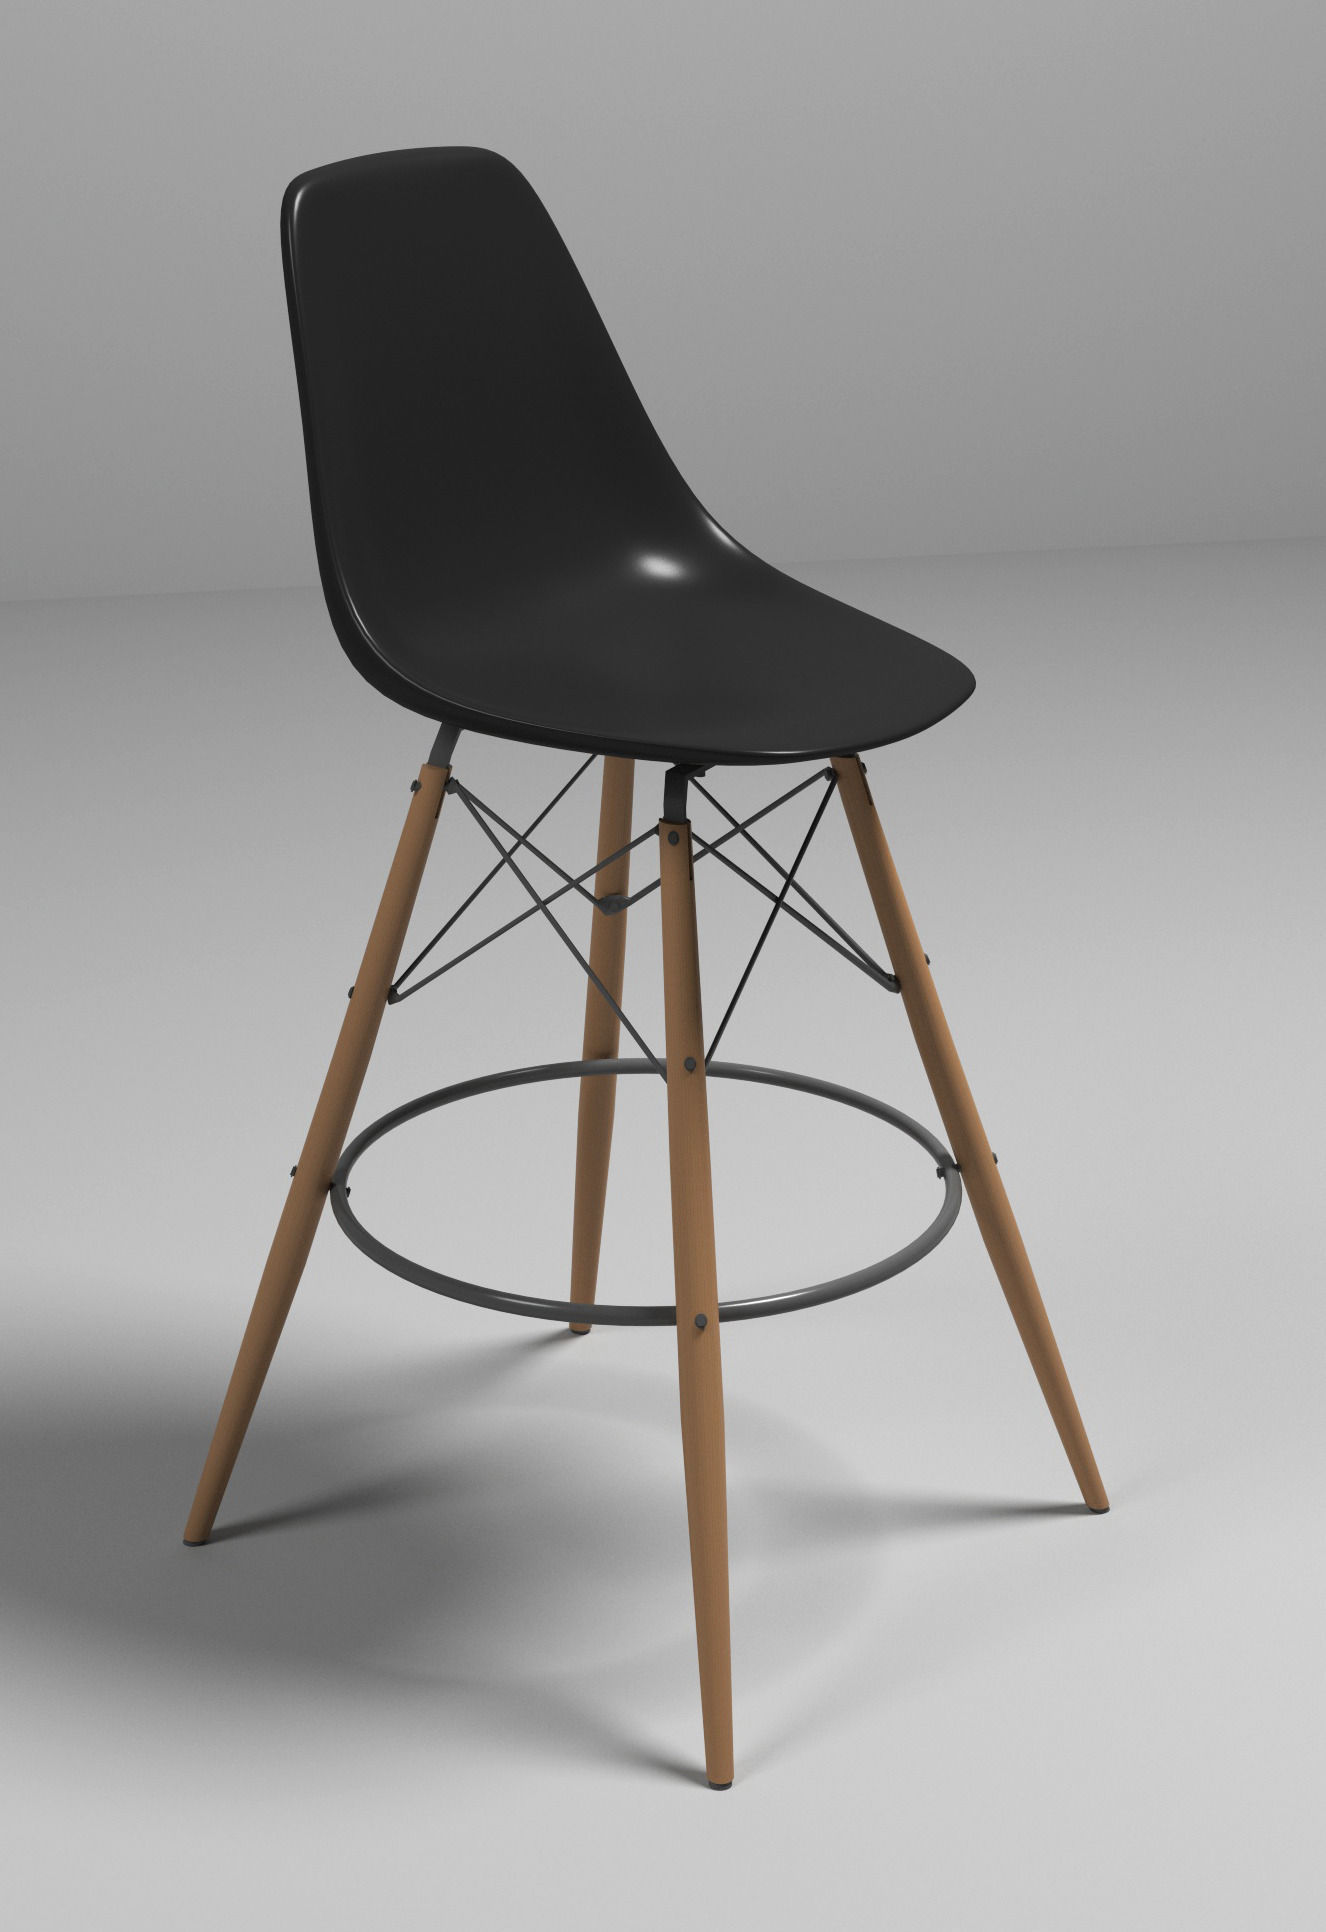 eames bar chair 3d model max obj 3ds fbx mtl 1 ... & 3D model Eames bar chair | CGTrader